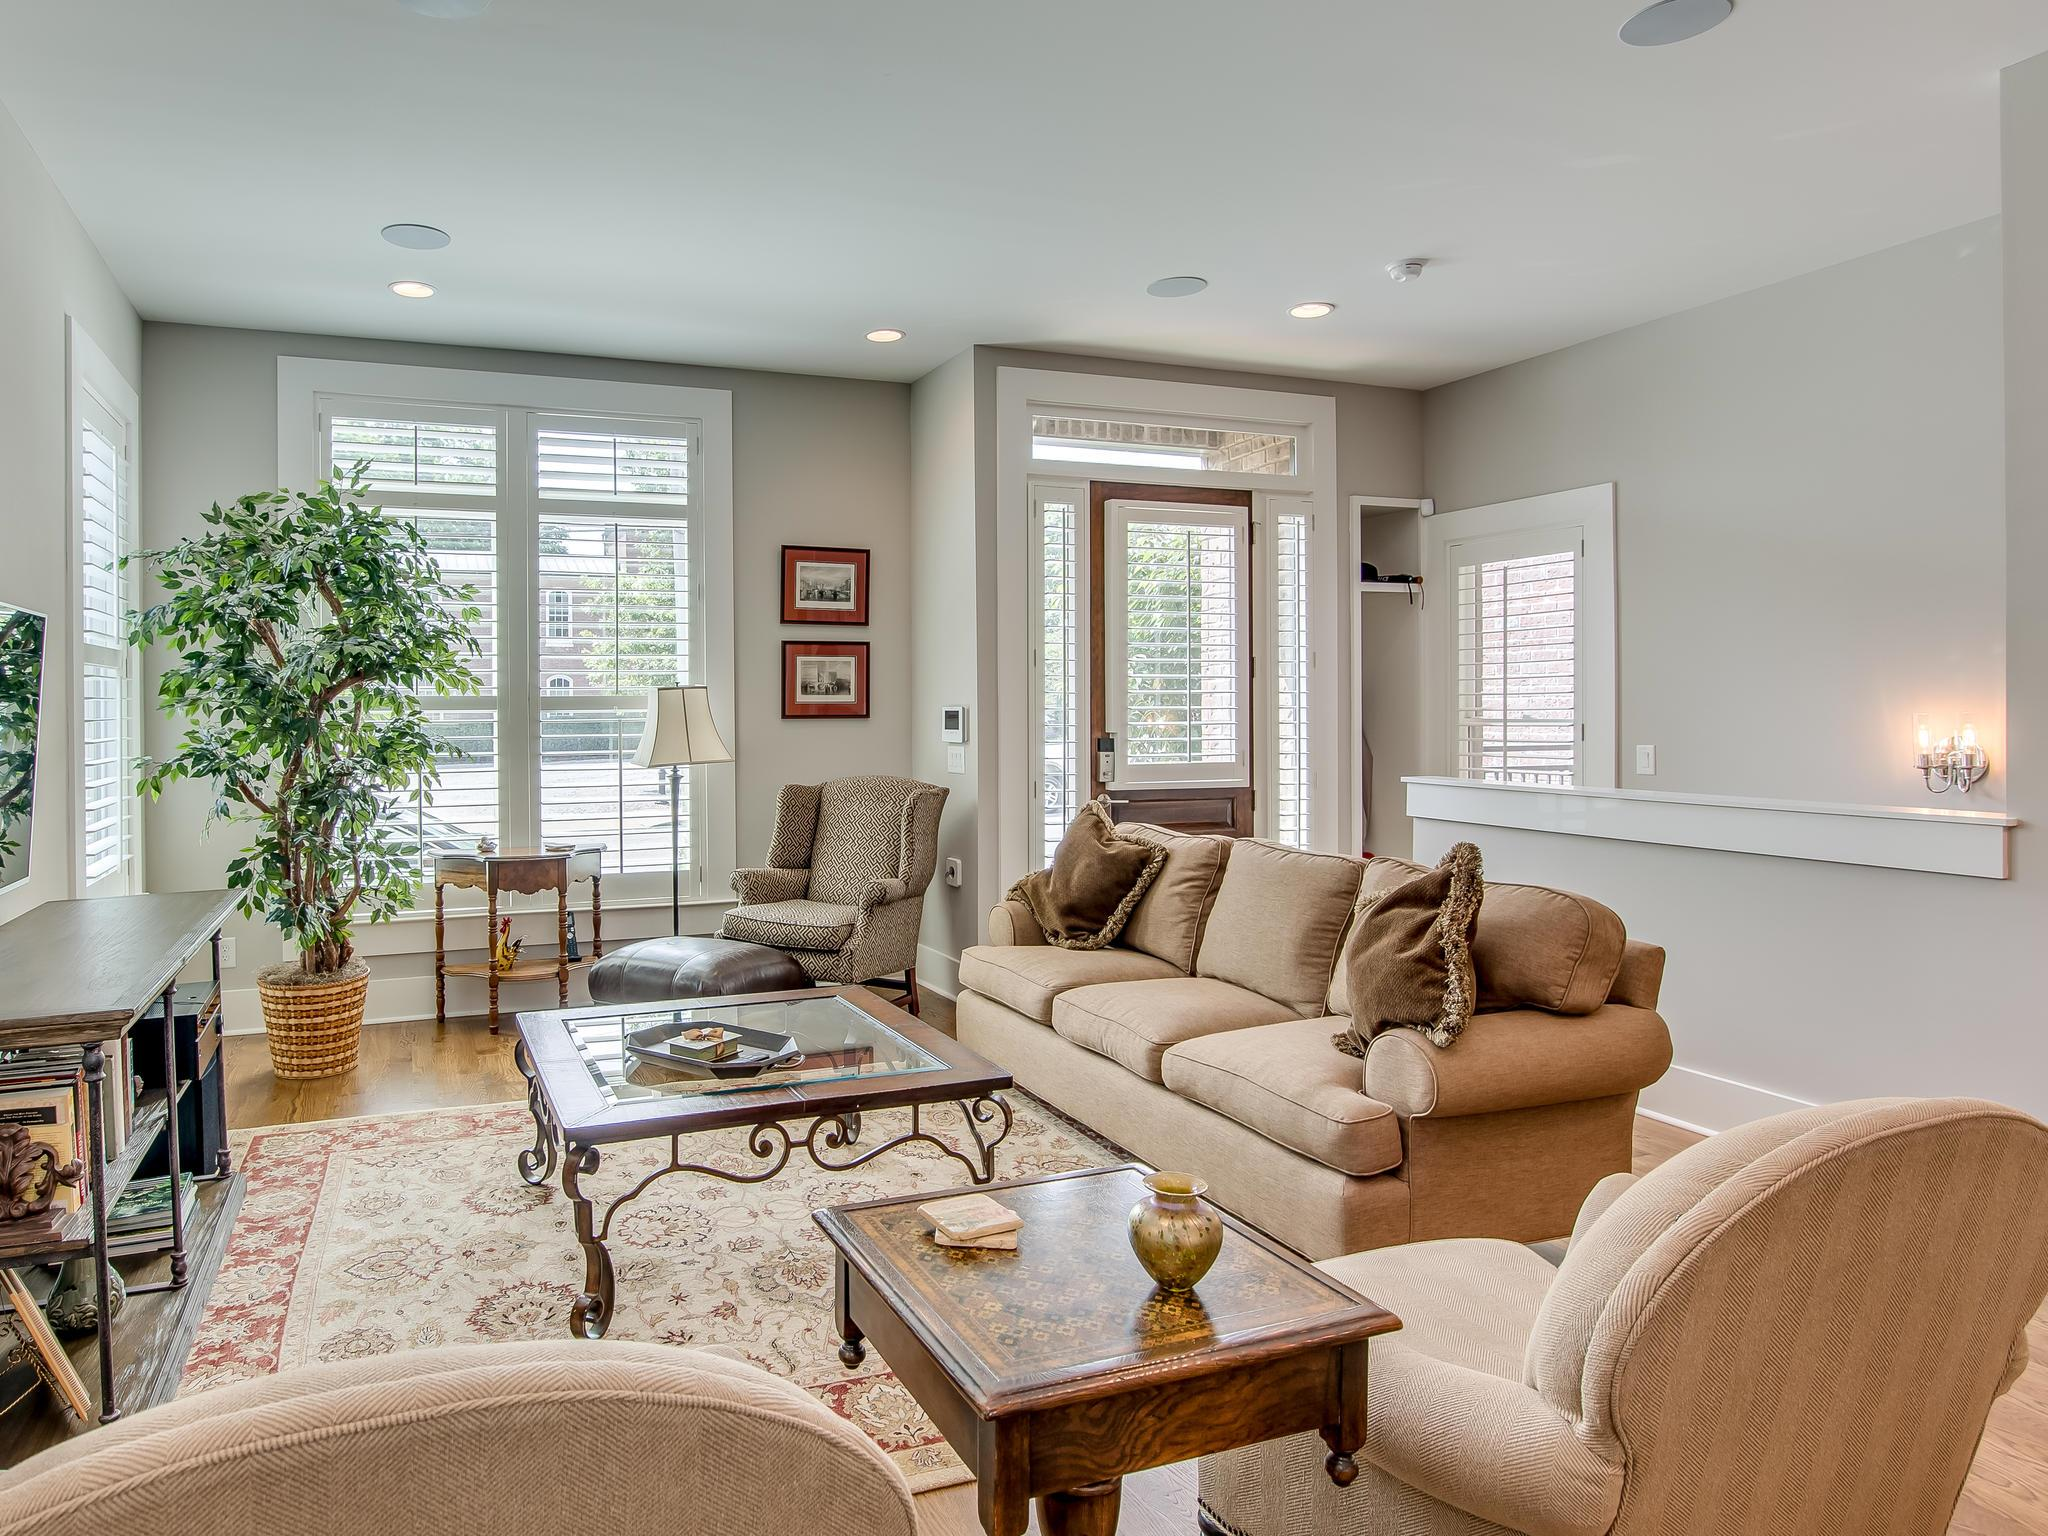 614 Monroe St, Nashville, TN 37208 - Nashville, TN real estate listing